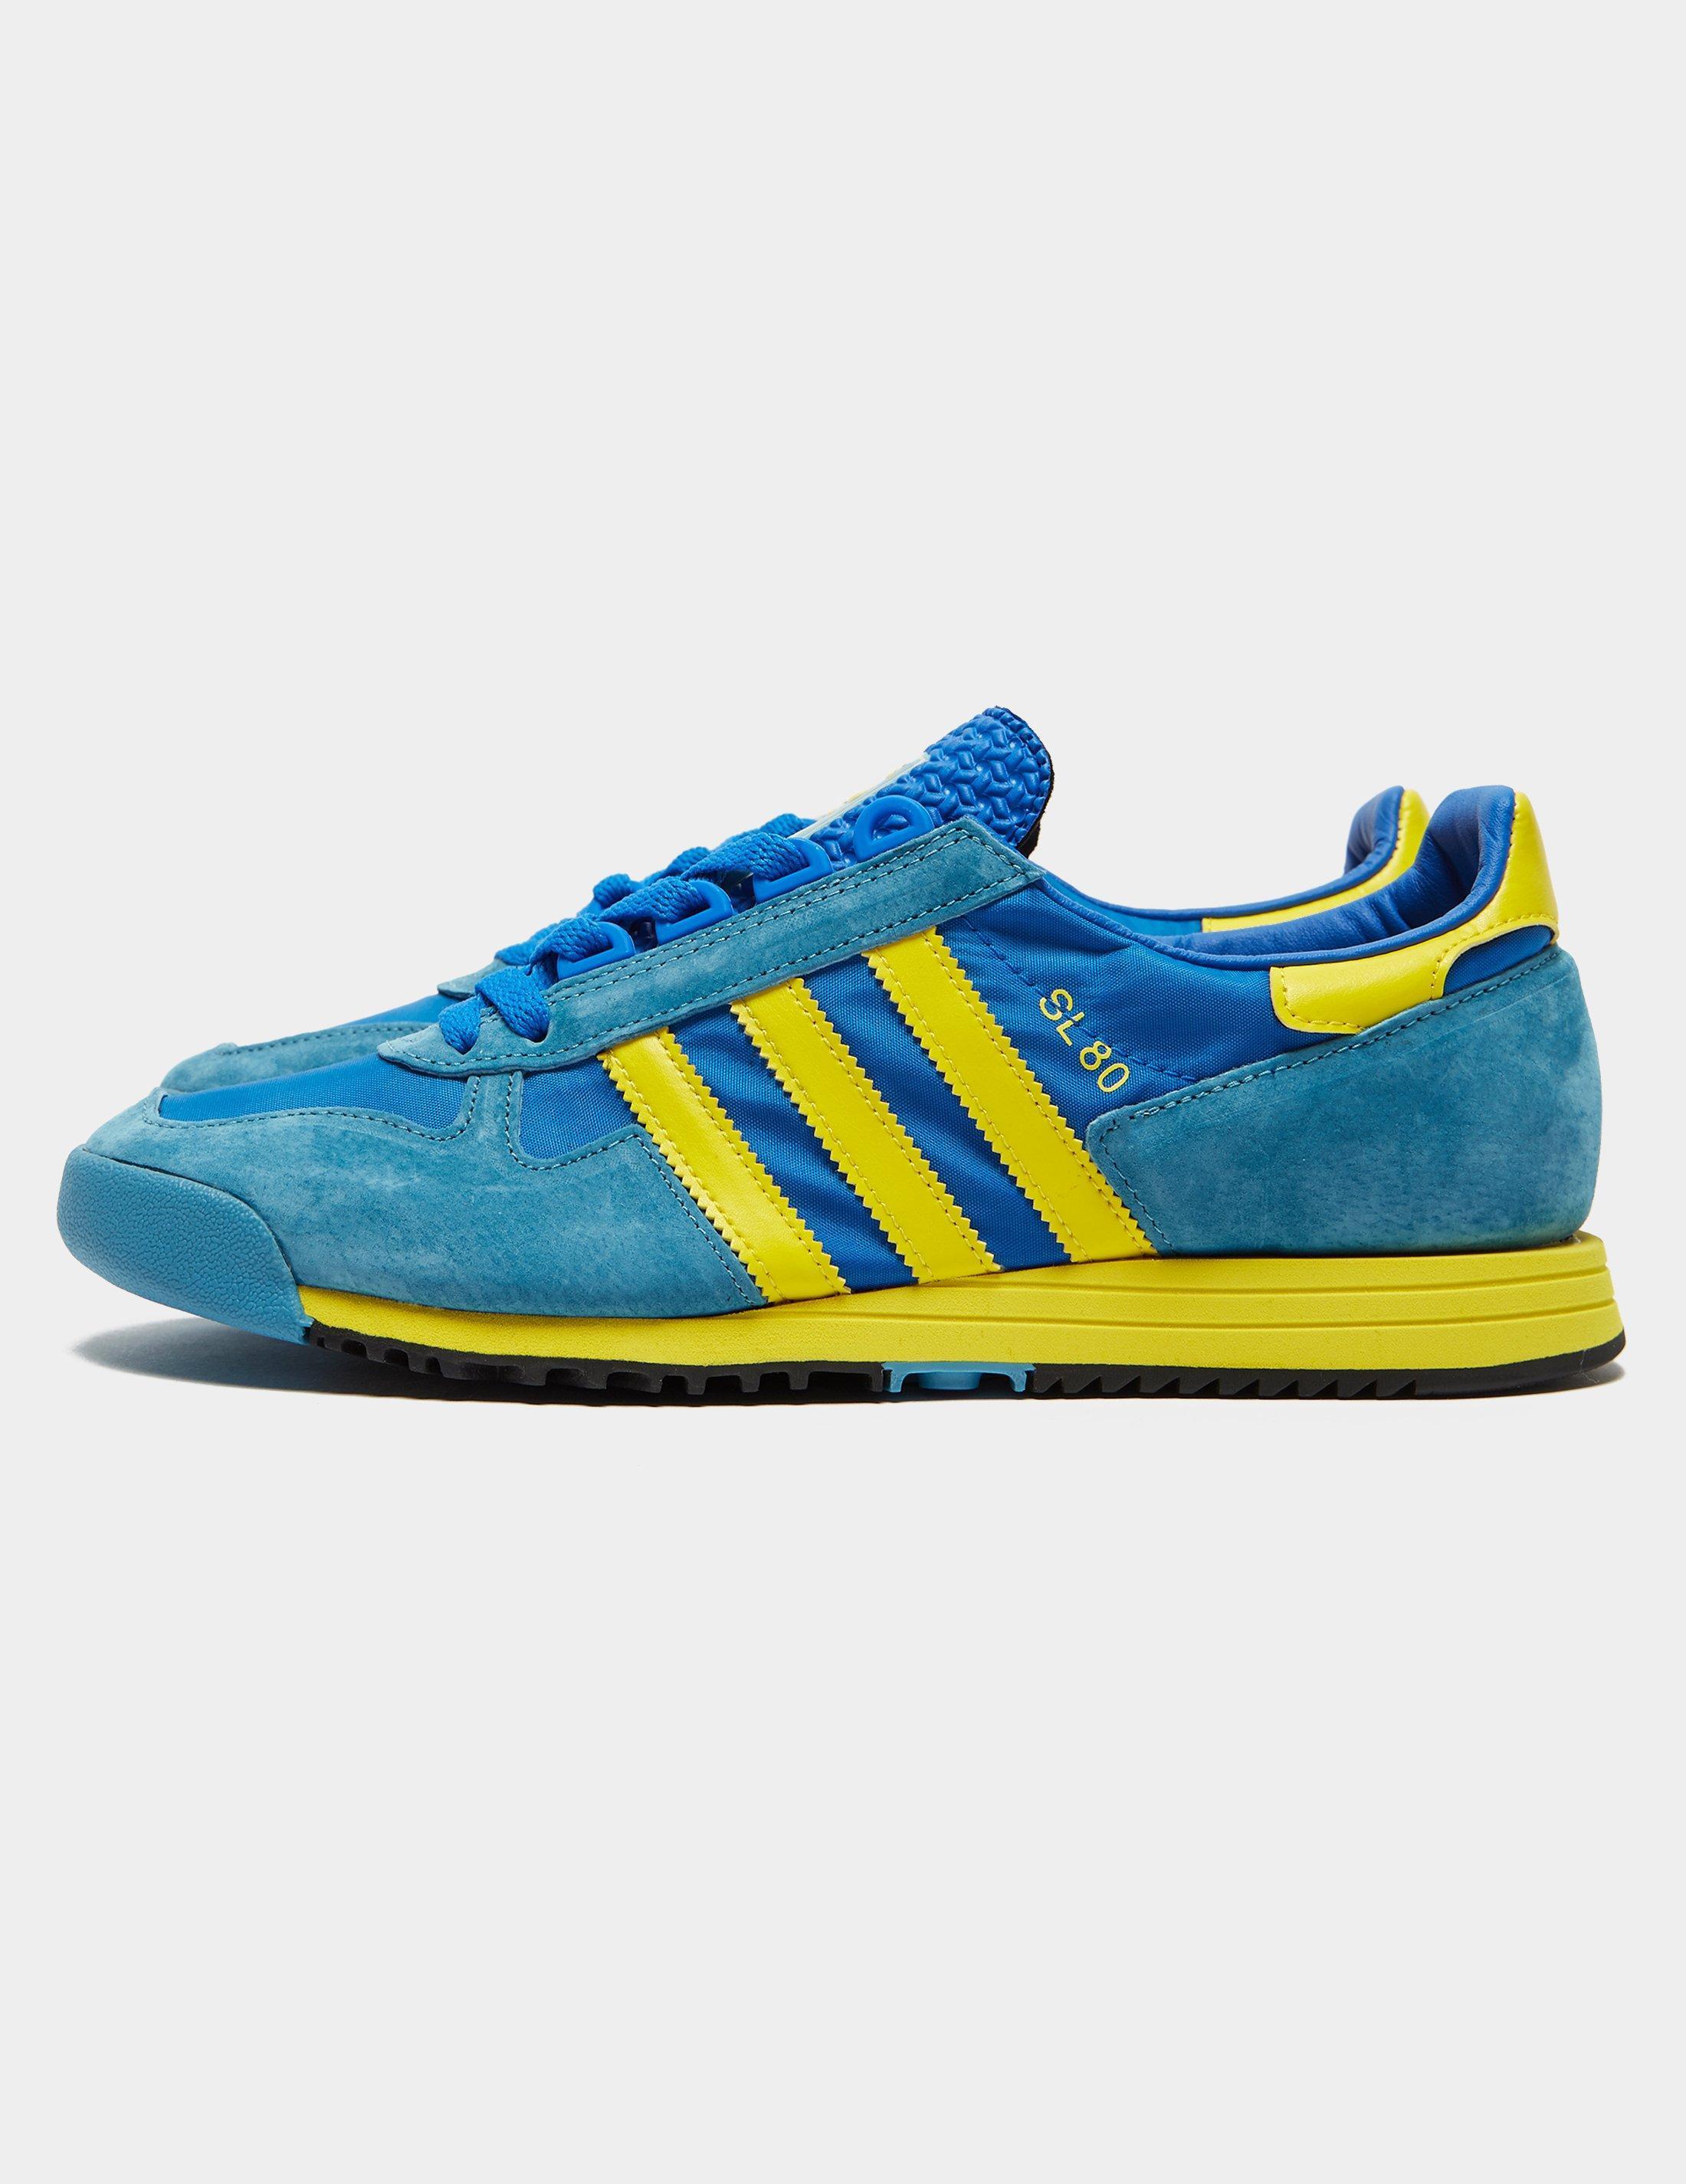 adidas Originals Synthetic Sl 80 Blue for Men - Lyst